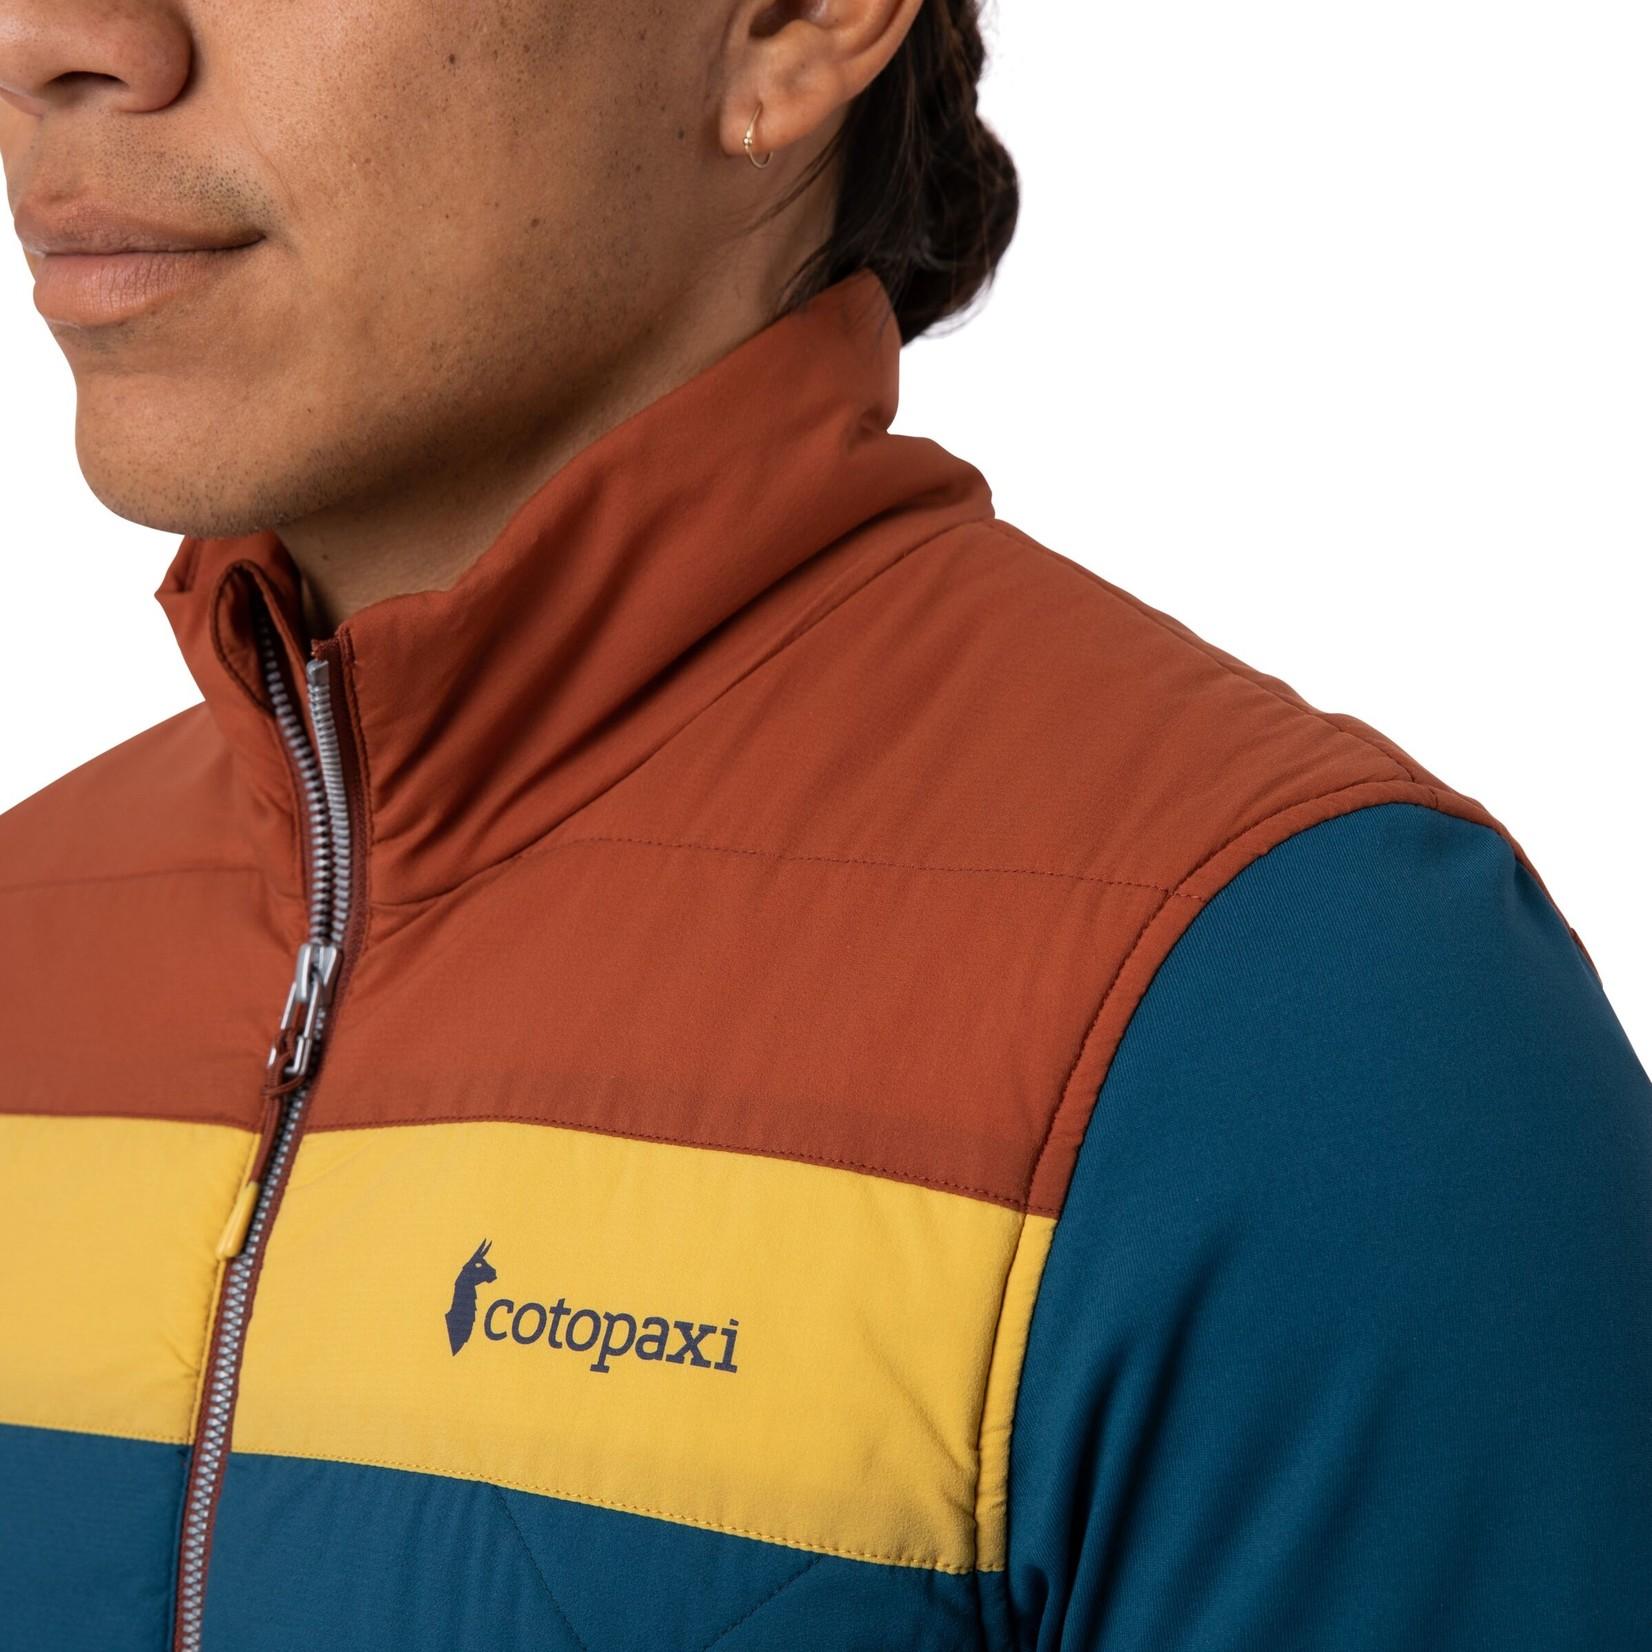 Cotopaxi Men's Monte Hybrid Jacket